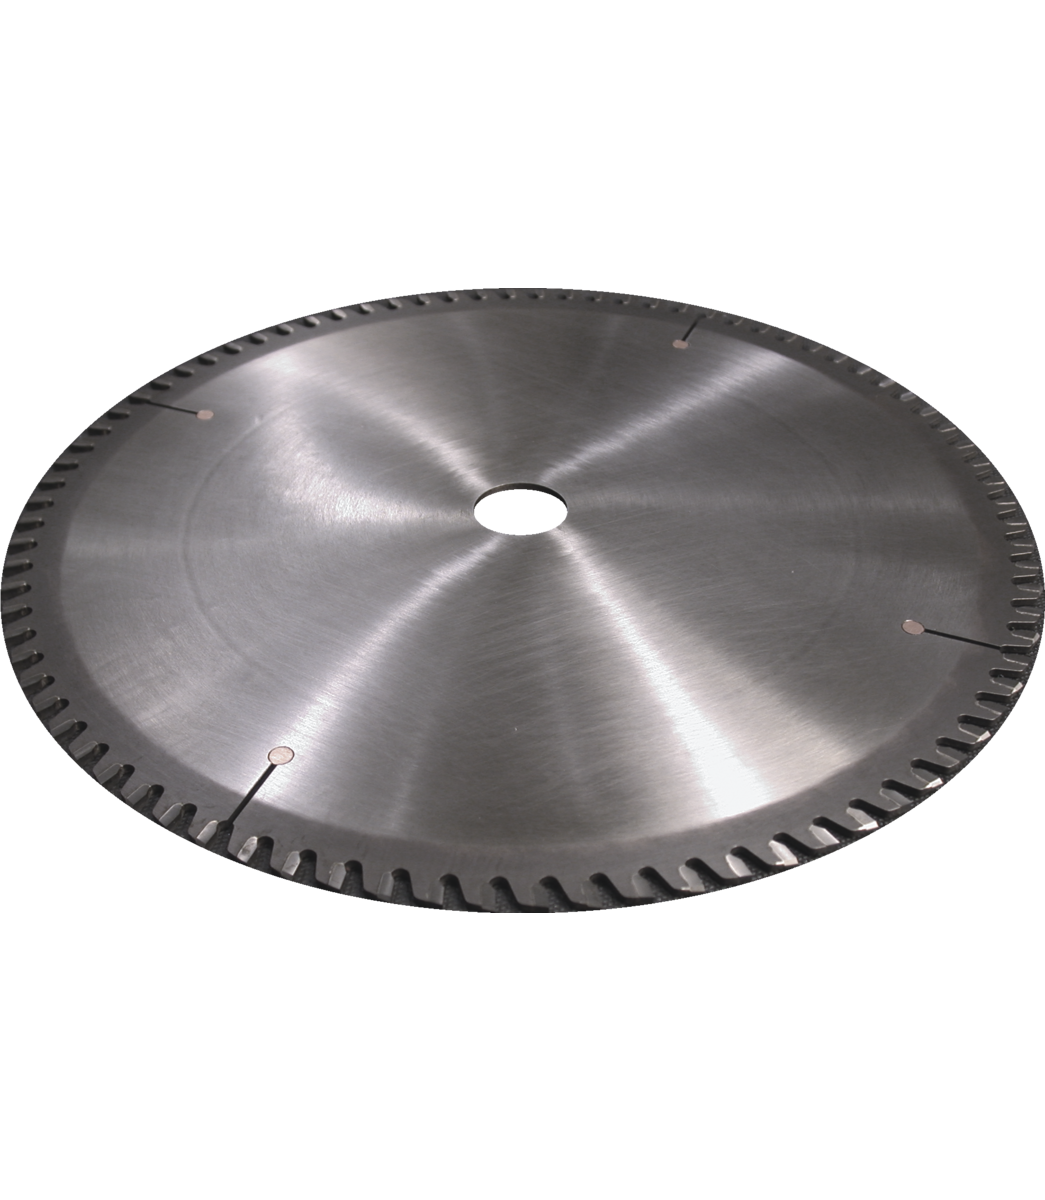 Ferrous Circular Saw Blade 350mm x 32mm x 2.5mm x 100T for J-FK350-2/4K